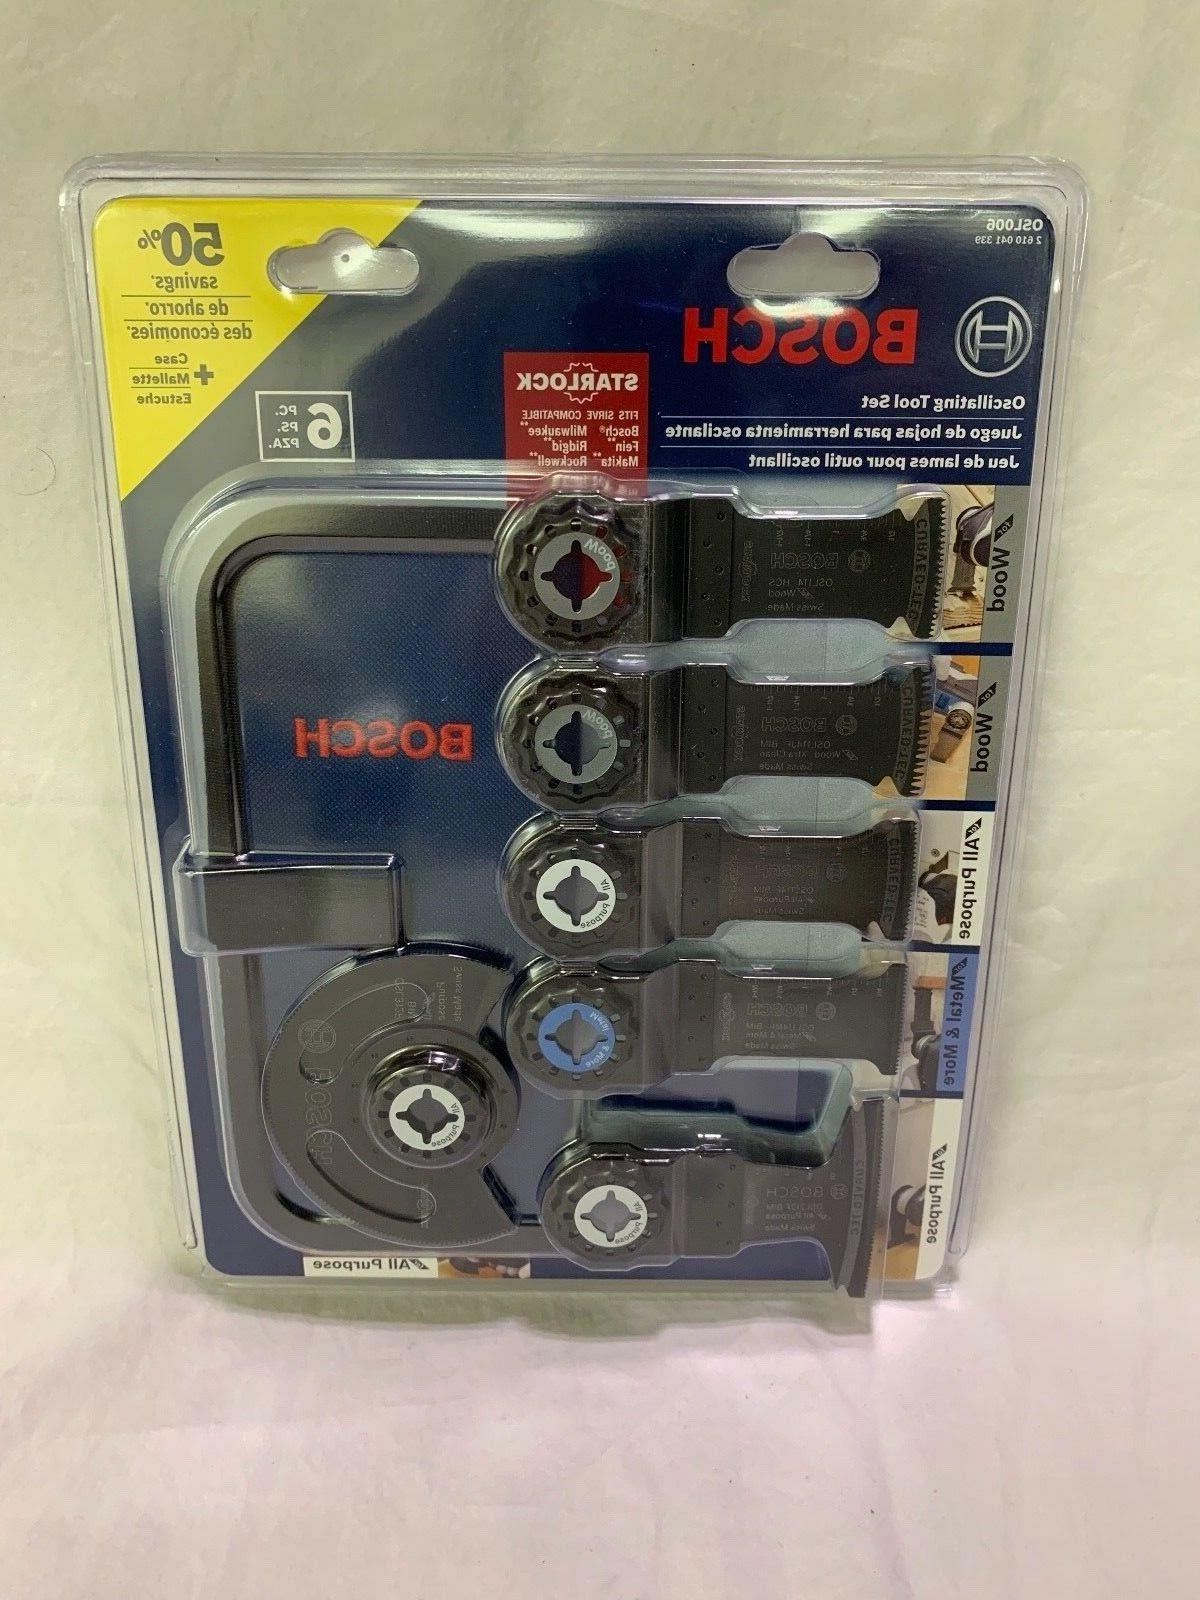 osl006 starlock oscillating multi tool accessory blade